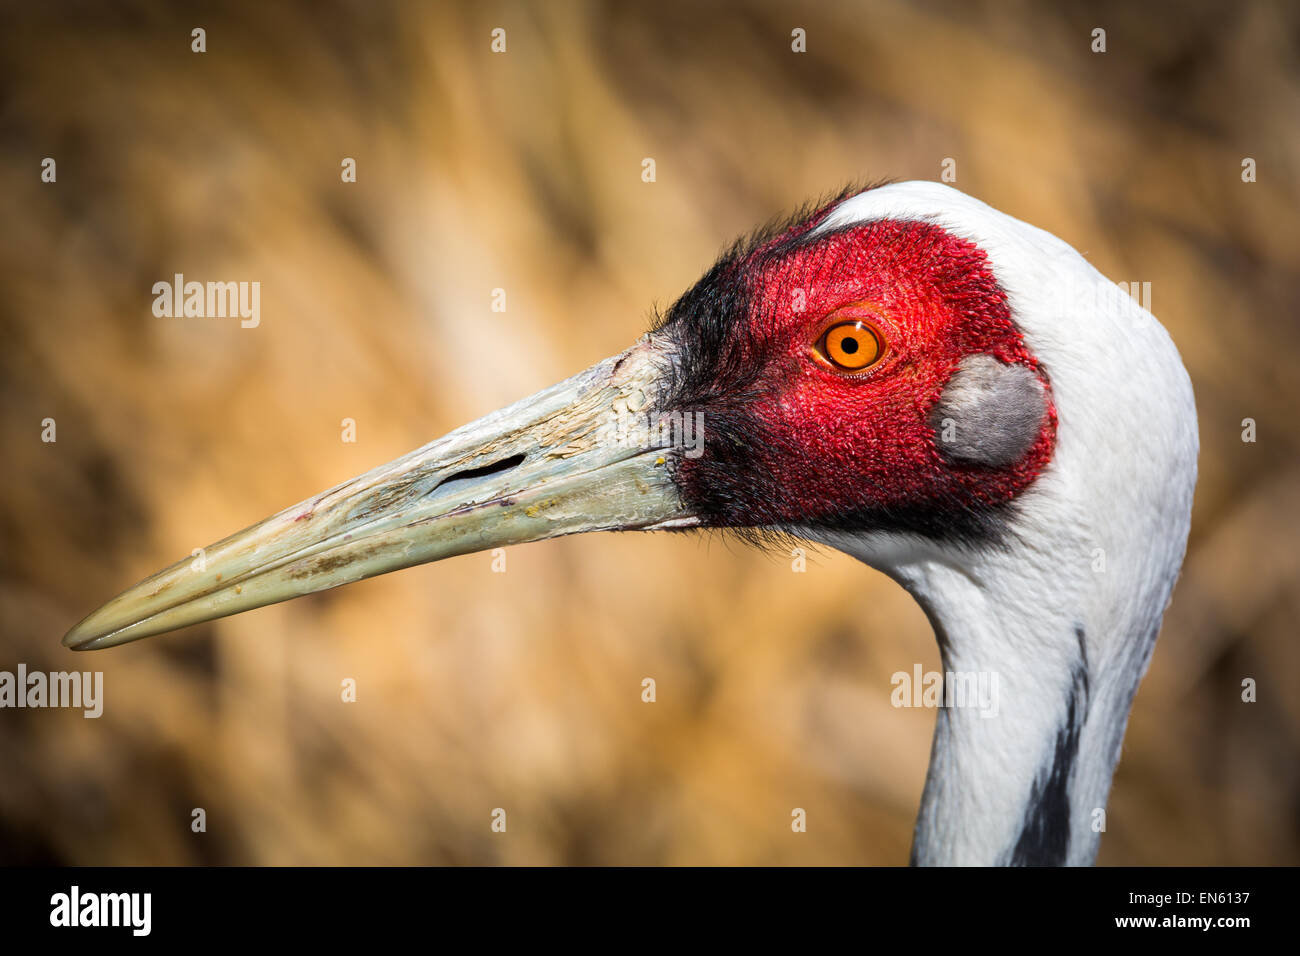 Portrait of male Sarus Crane. The Sarus Crane (Grus antigone) is the tallest flying bird. - Stock Image